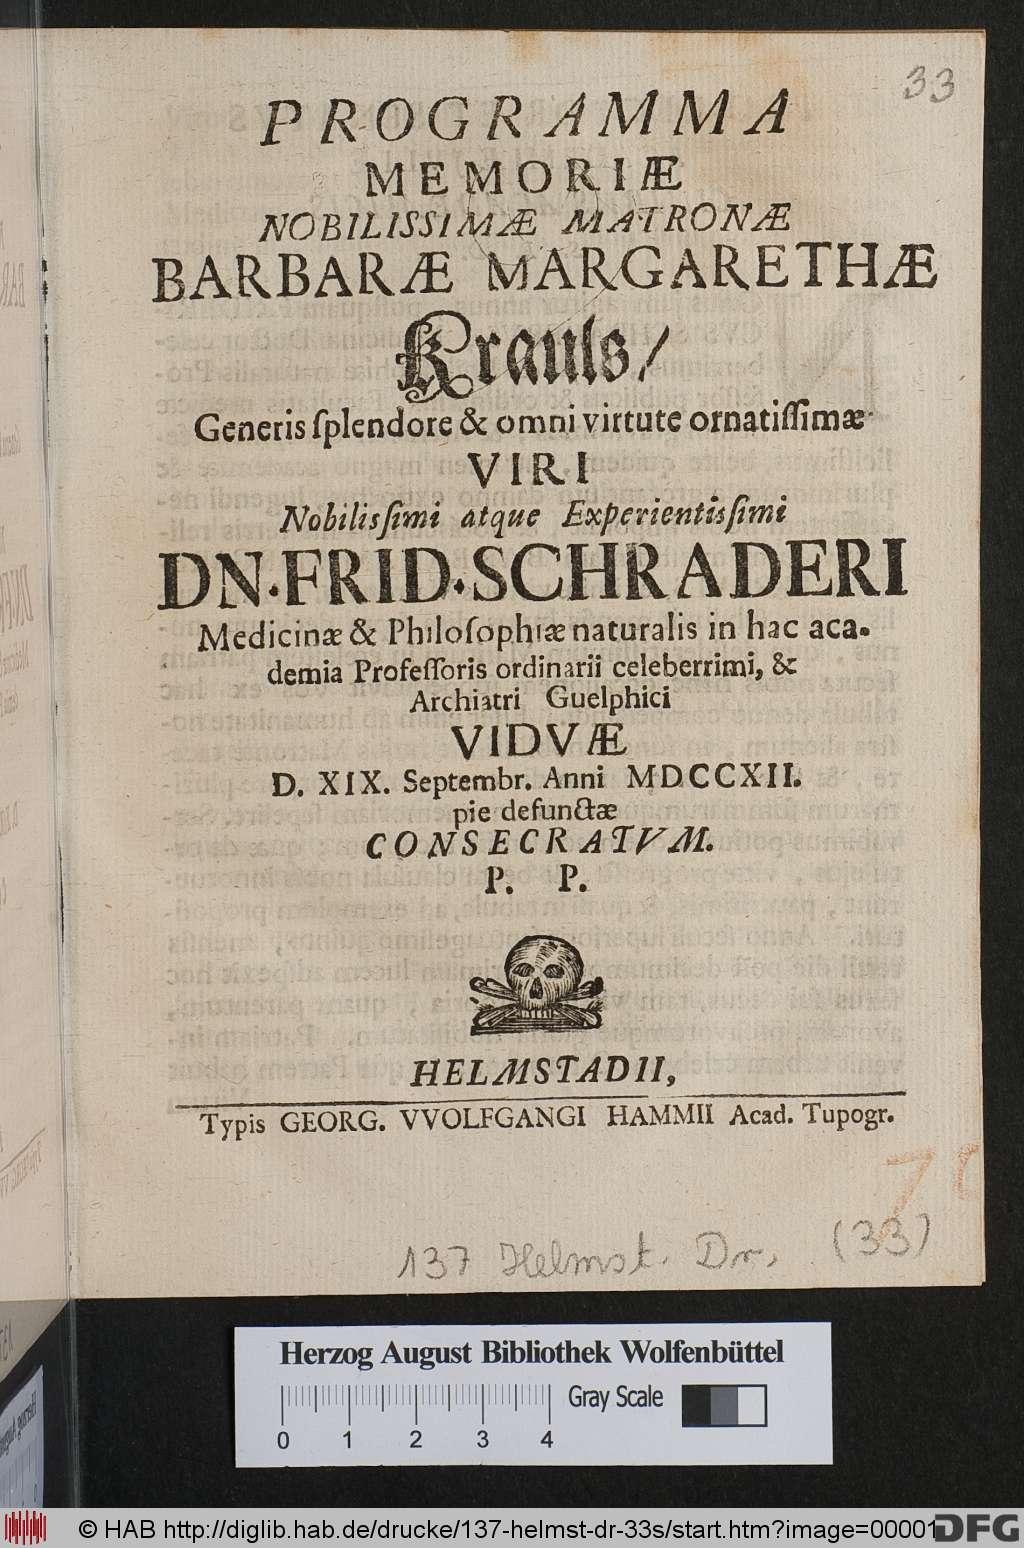 https://diglib.hab.de/drucke/137-helmst-dr-33s/00001.jpg